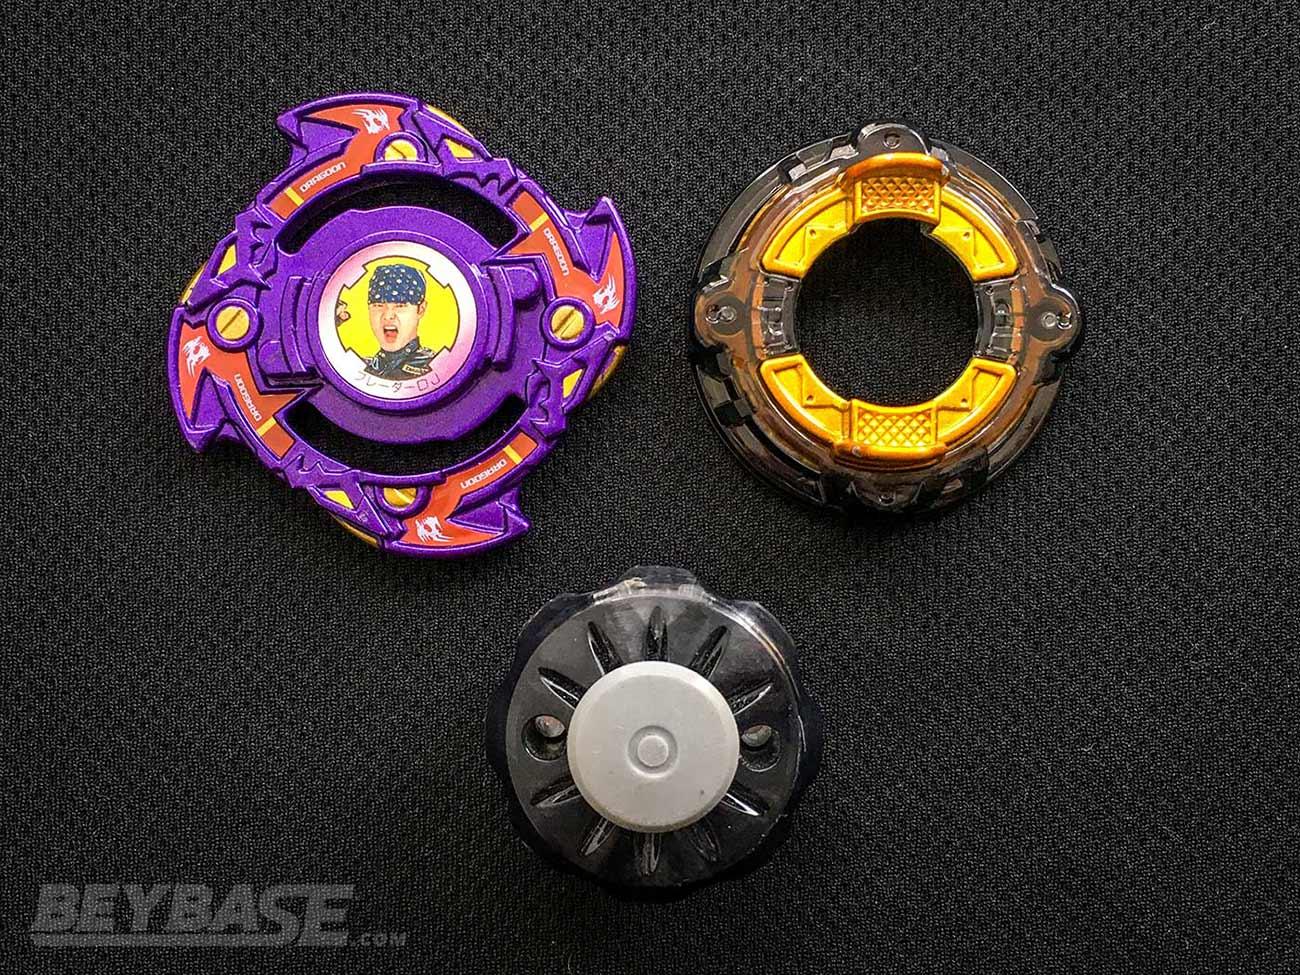 beyblade burst classic stamina combo parts: dragoon f layer, polish disk, and drift driver